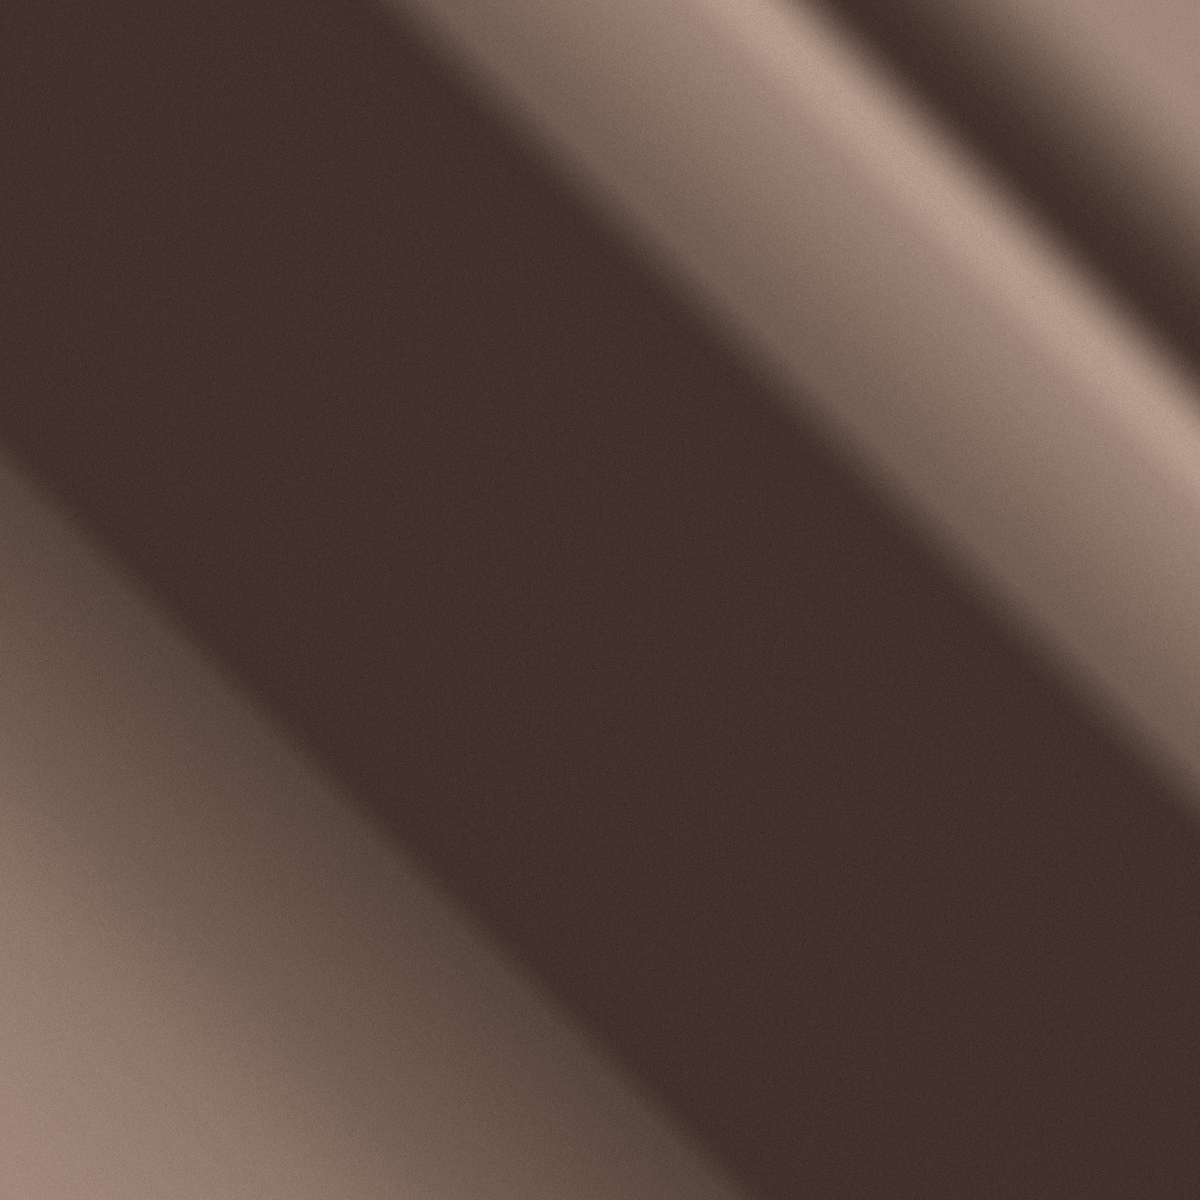 Metallo Verniciato Bronzo Chiaro